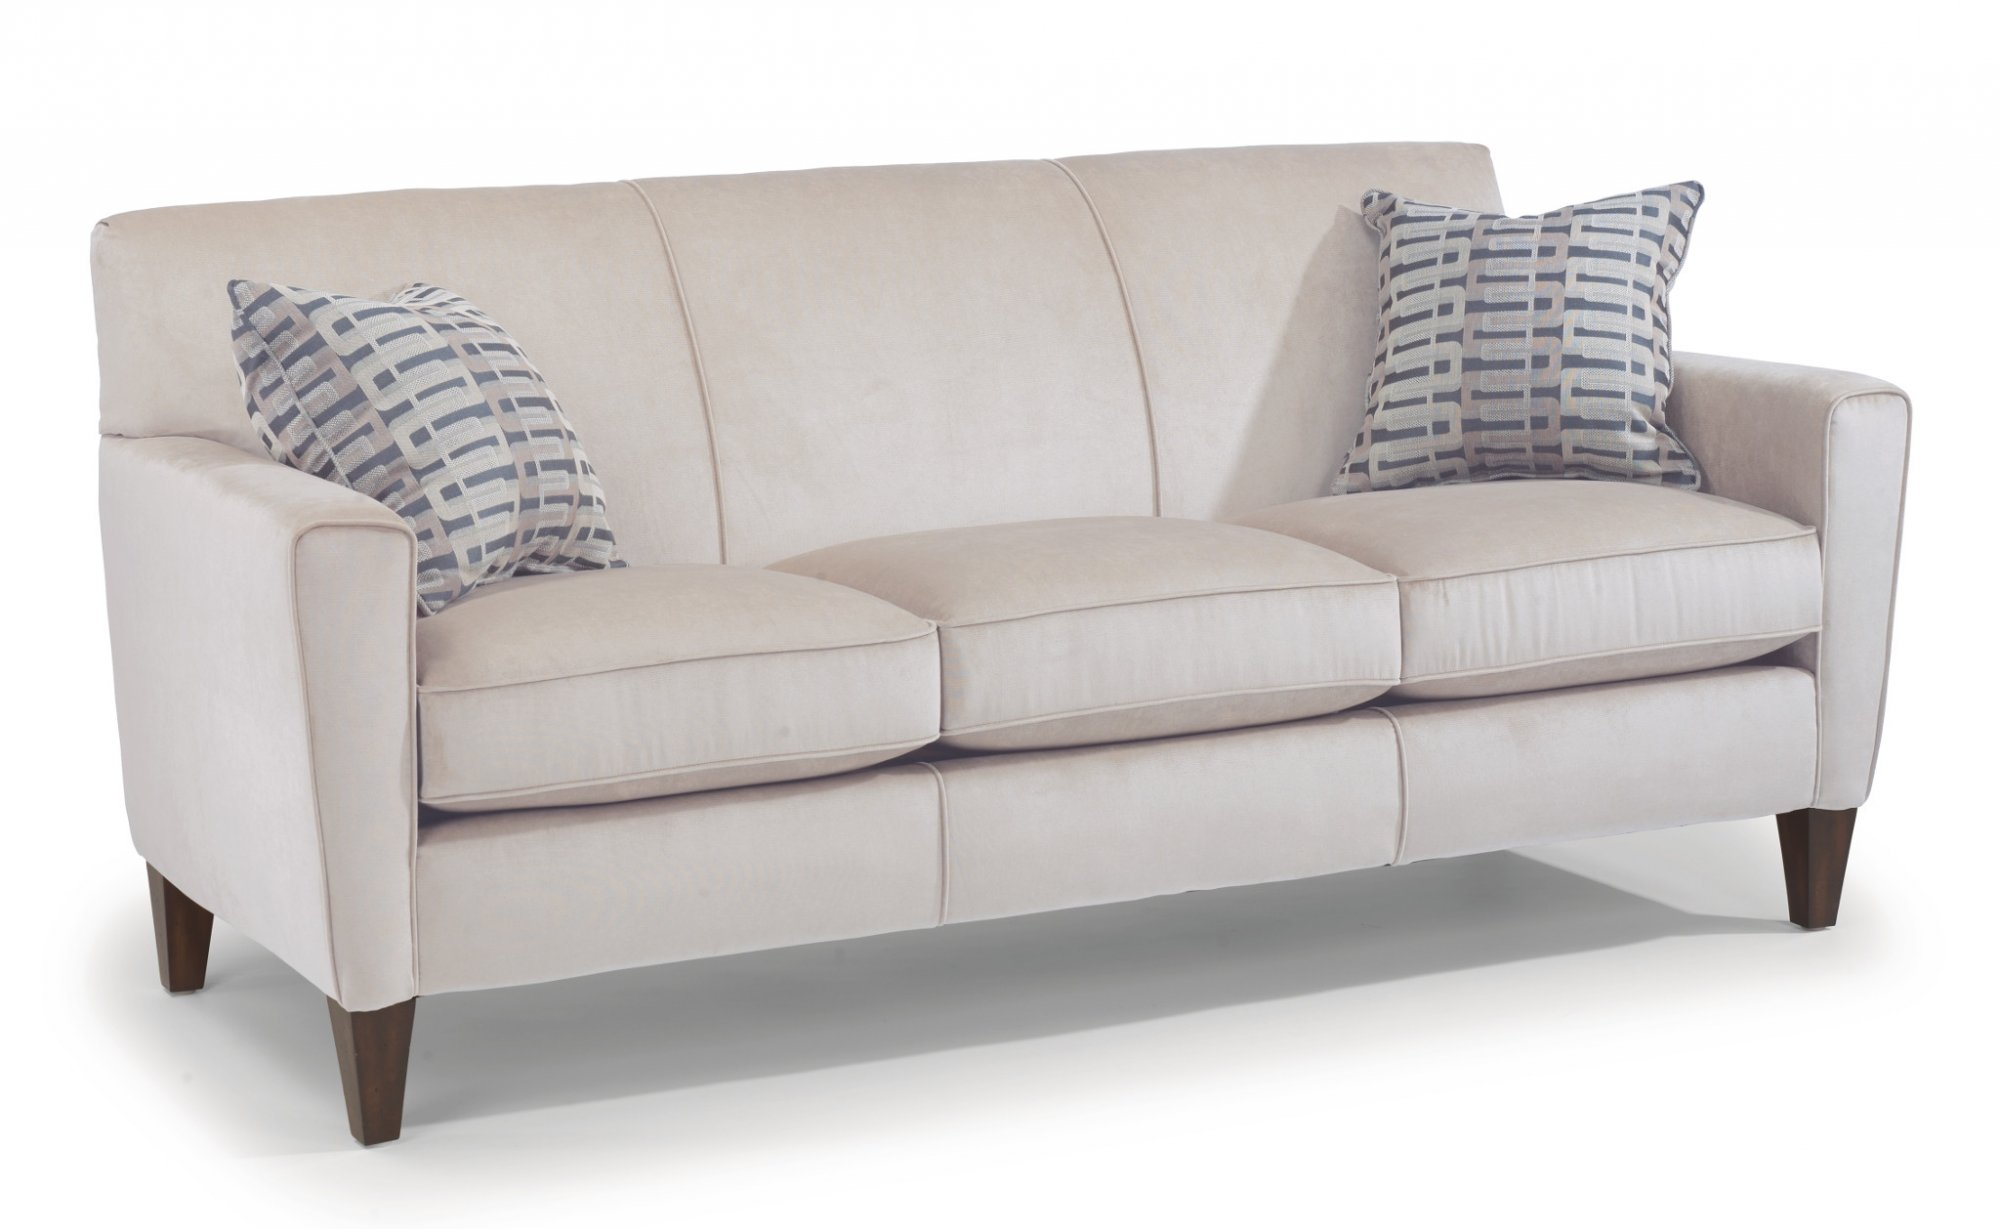 Flexsteel Colt Versatile Club Chair Contemporary Design